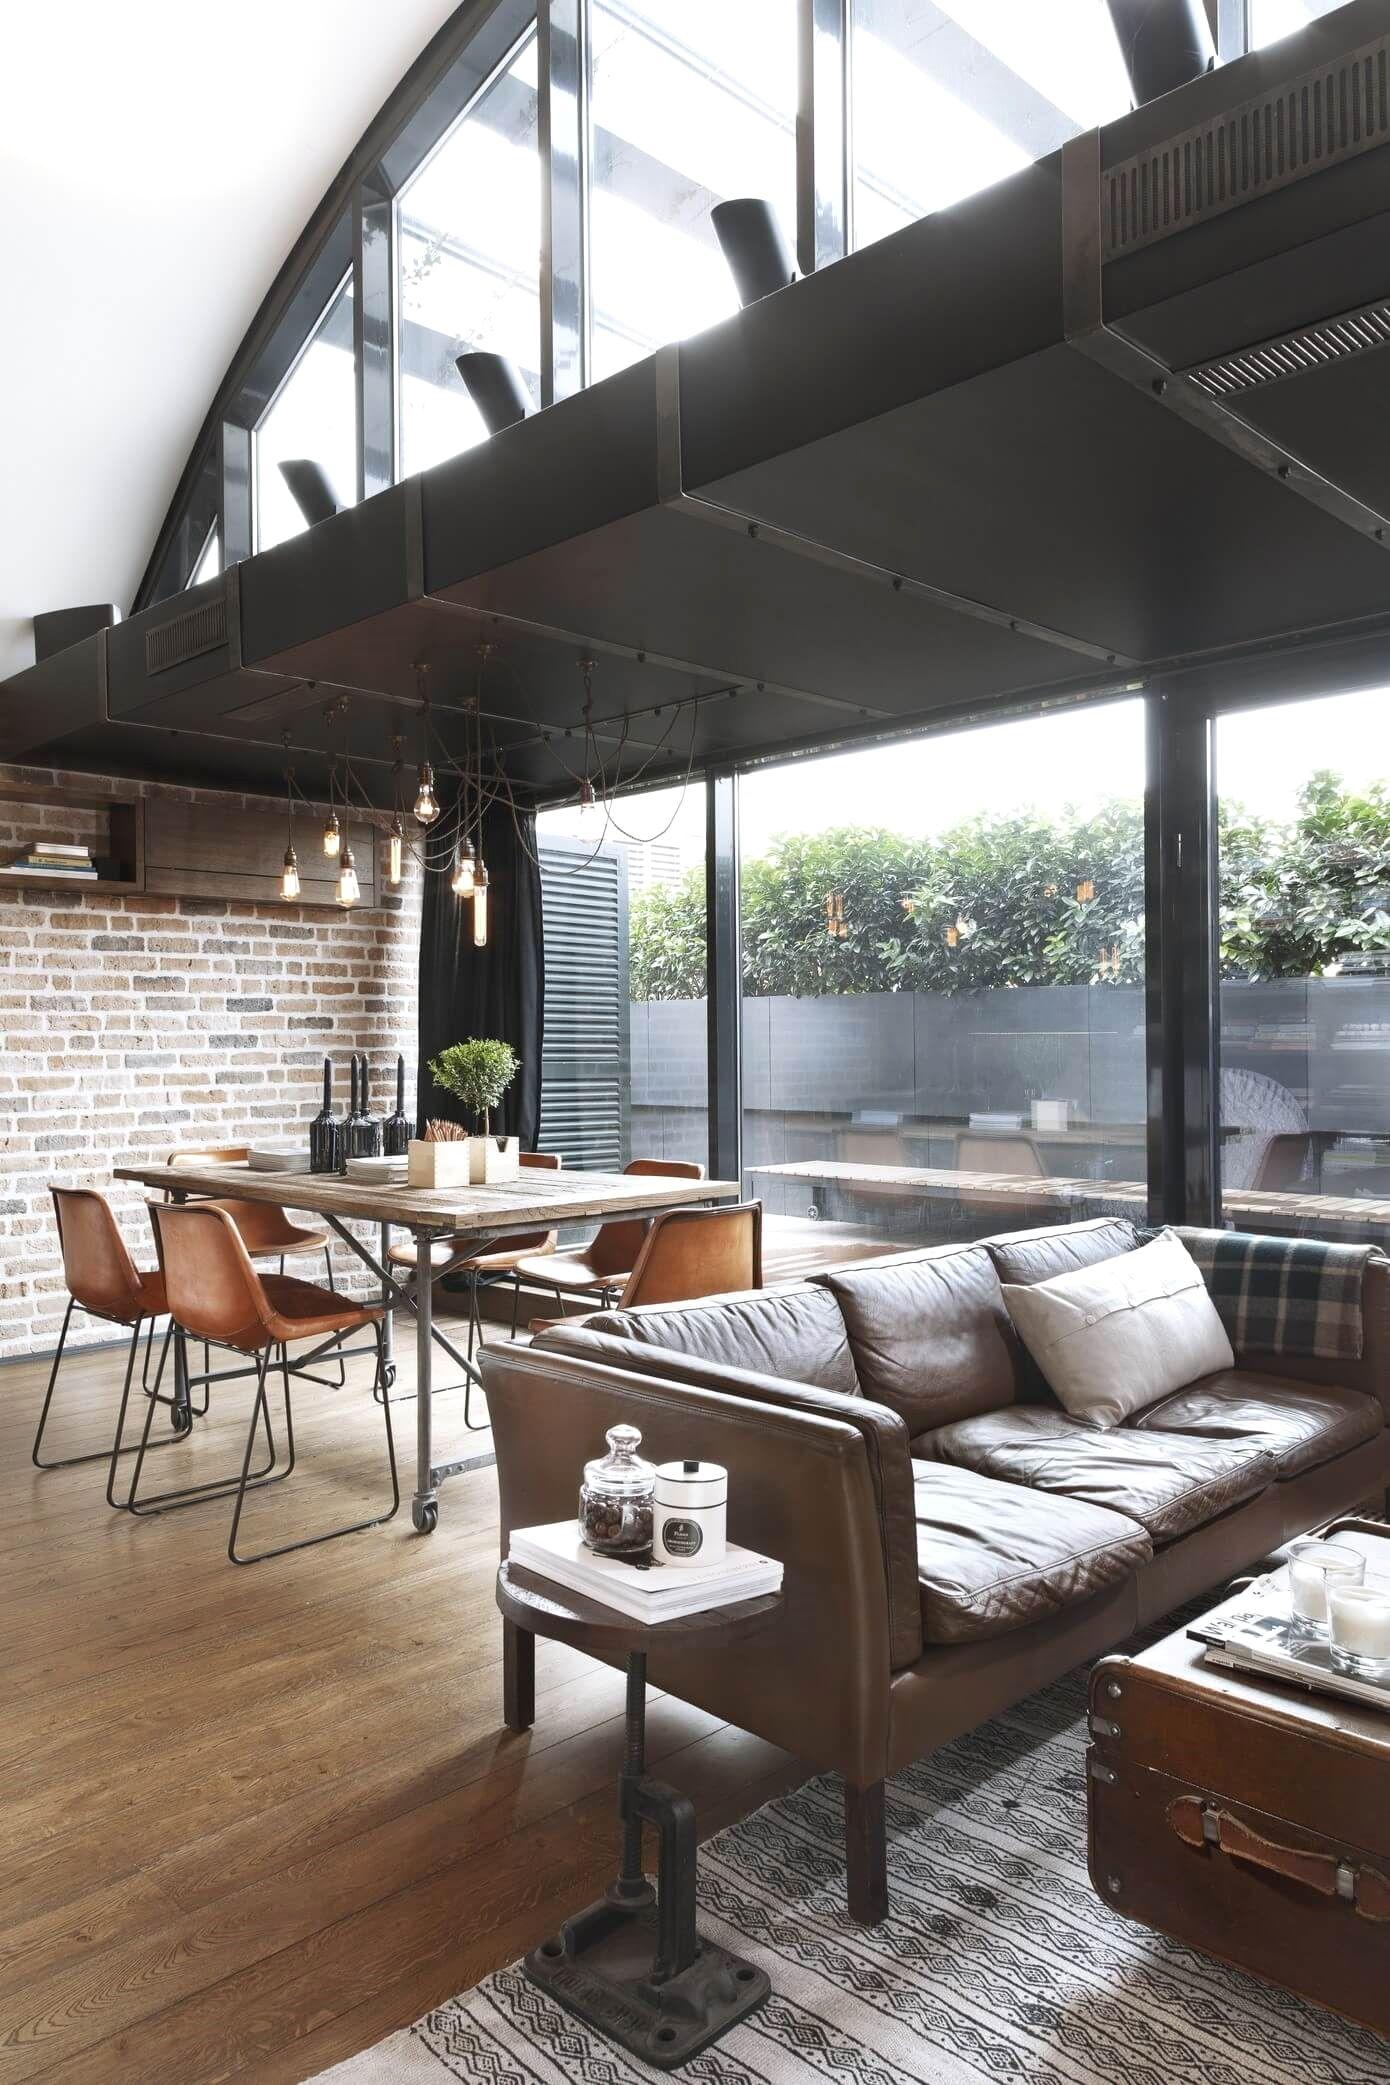 12 Easy Industrial Decor Ideas For Your Urban Loft Industrial